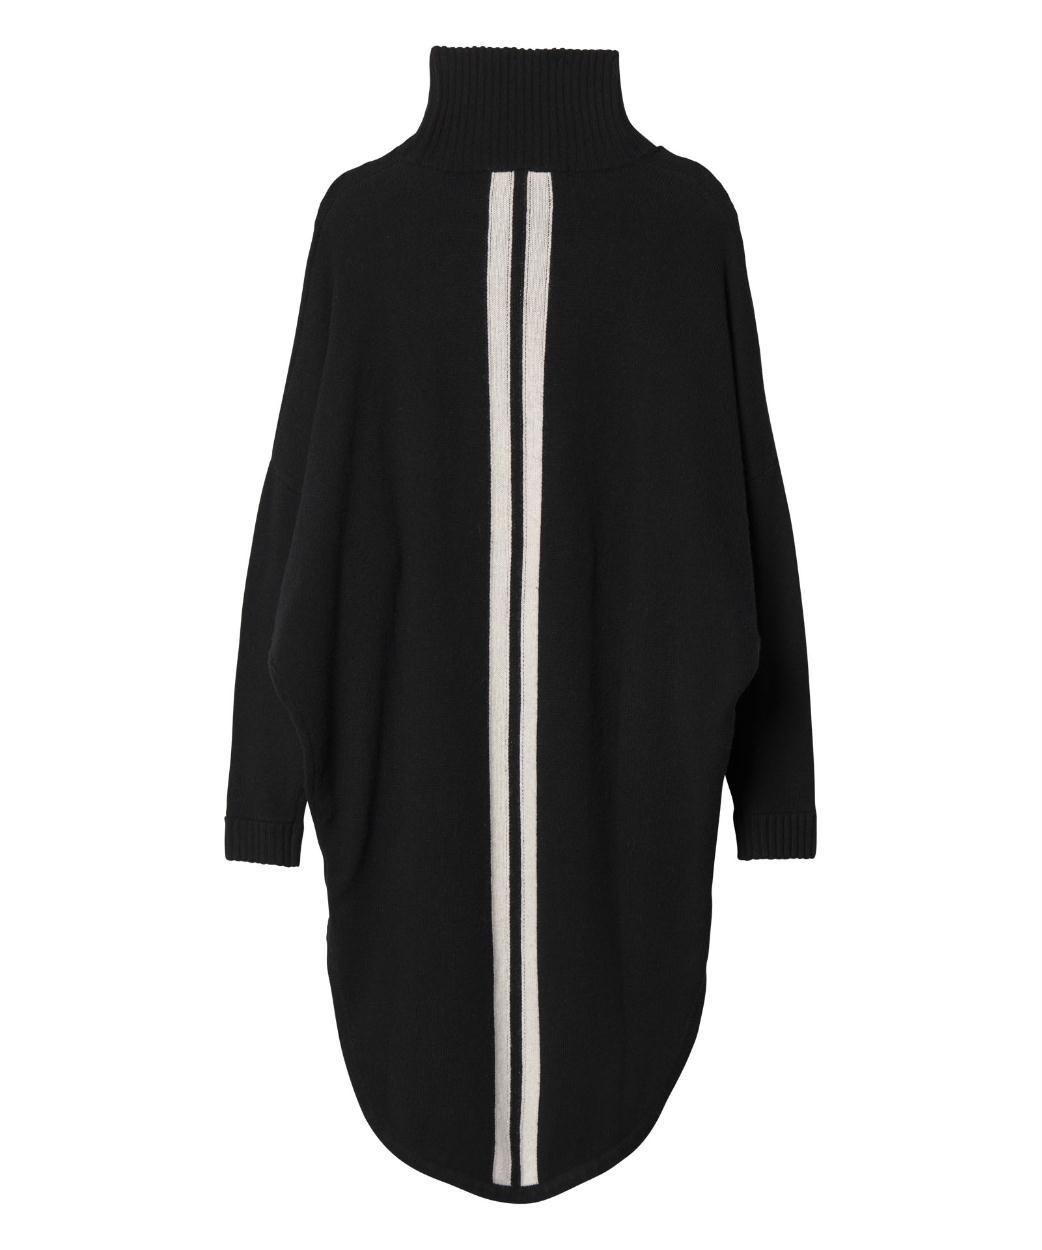 10Days Black Col Dress 20.633.9103/9